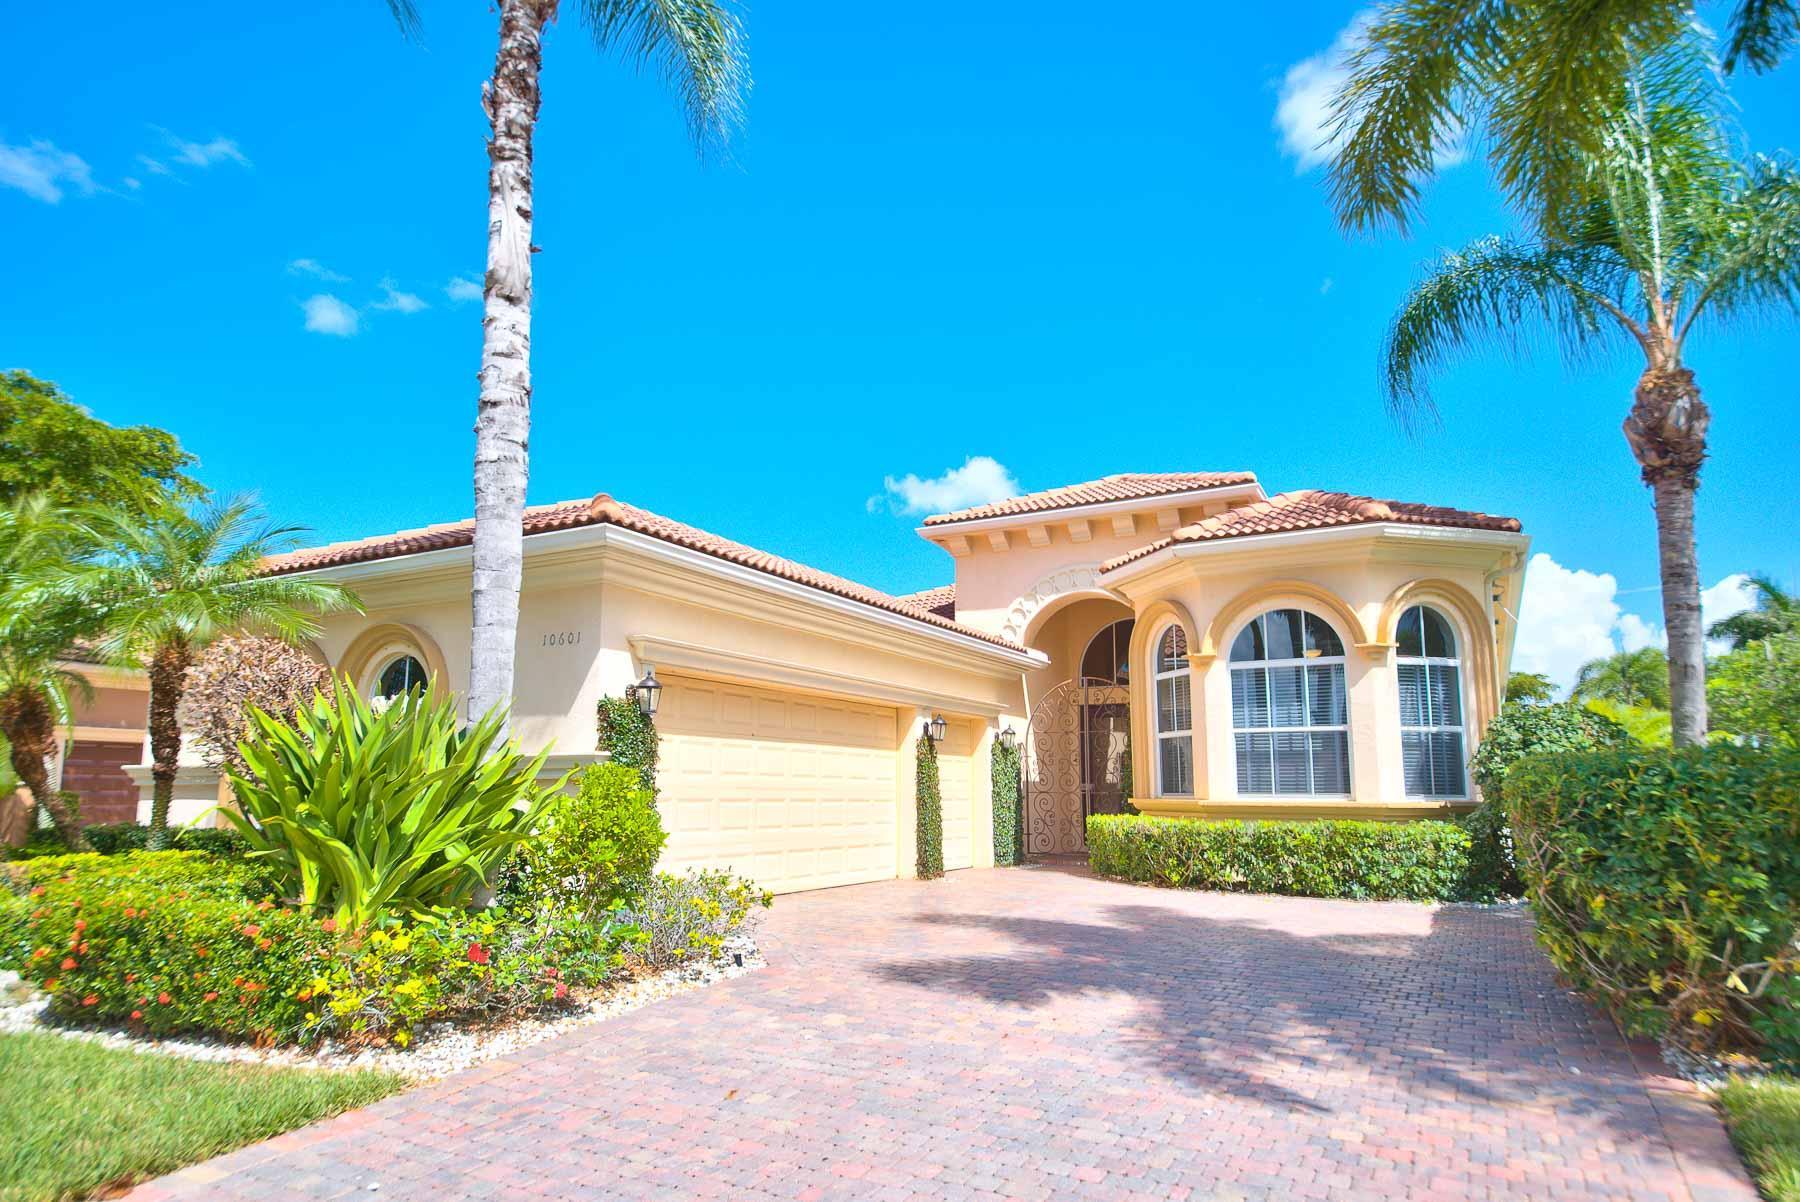 10601 Piazza Fontana, West Palm Beach, Florida 33412, 3 Bedrooms Bedrooms, ,3 BathroomsBathrooms,Single Family,For Rent,Ibis Villagio,Piazza Fontana,RX-10525251